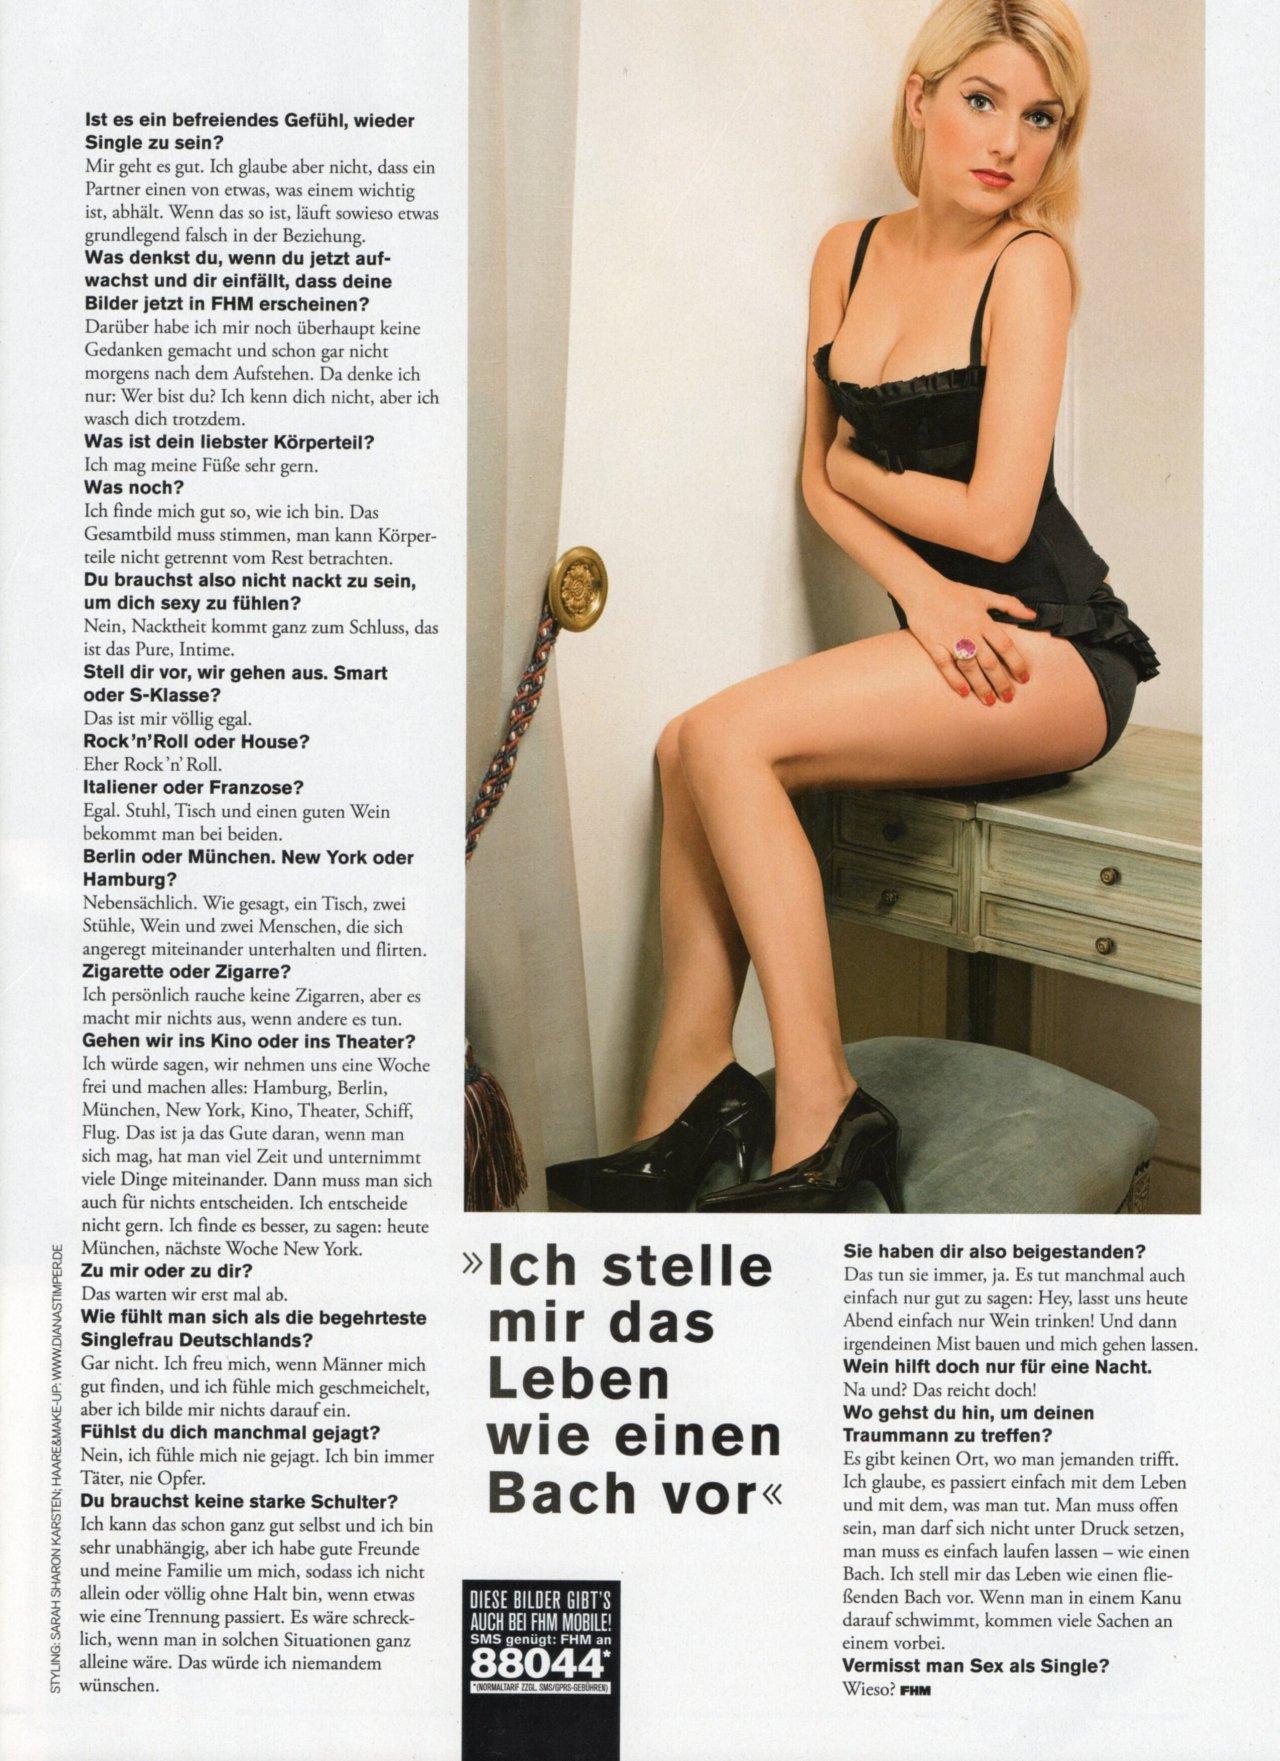 Janett bidermann nude nacked fakes porn pics